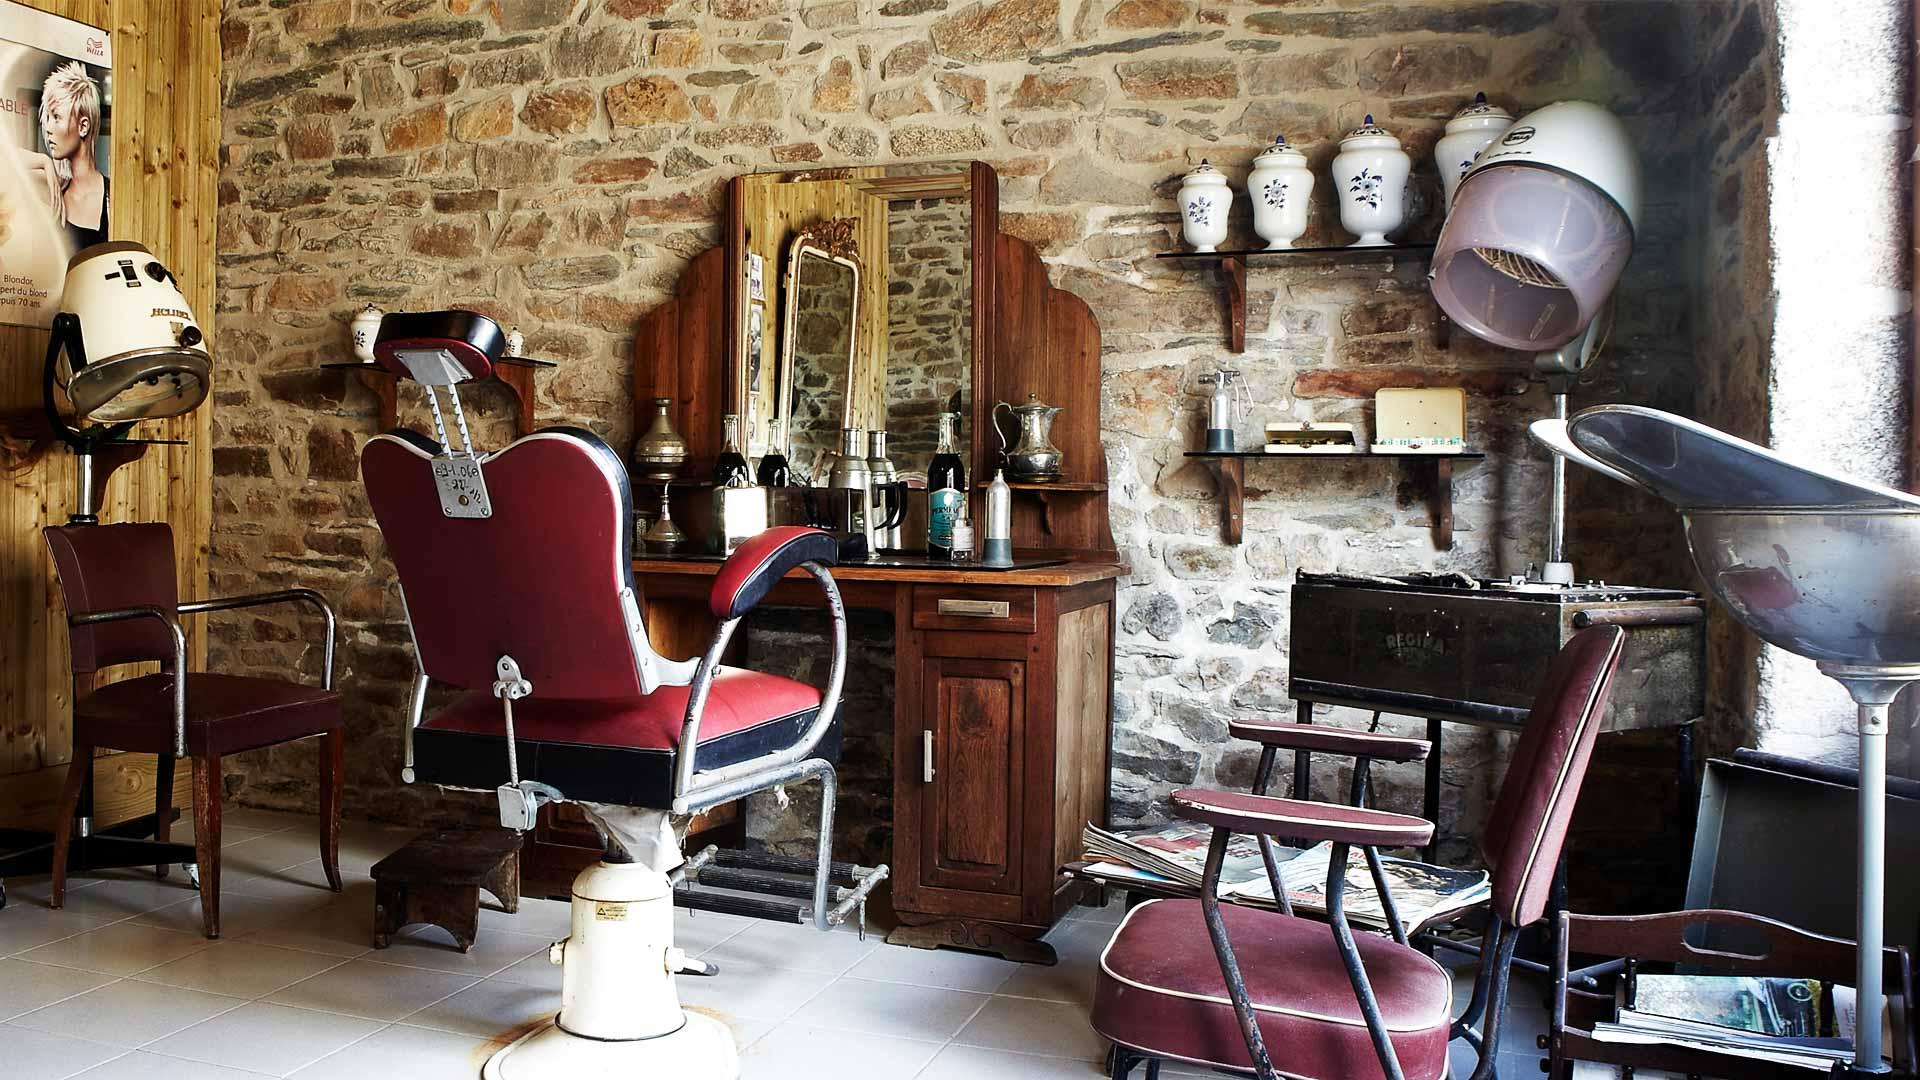 salon de coiffure ancien ecomusee de Plouigneau